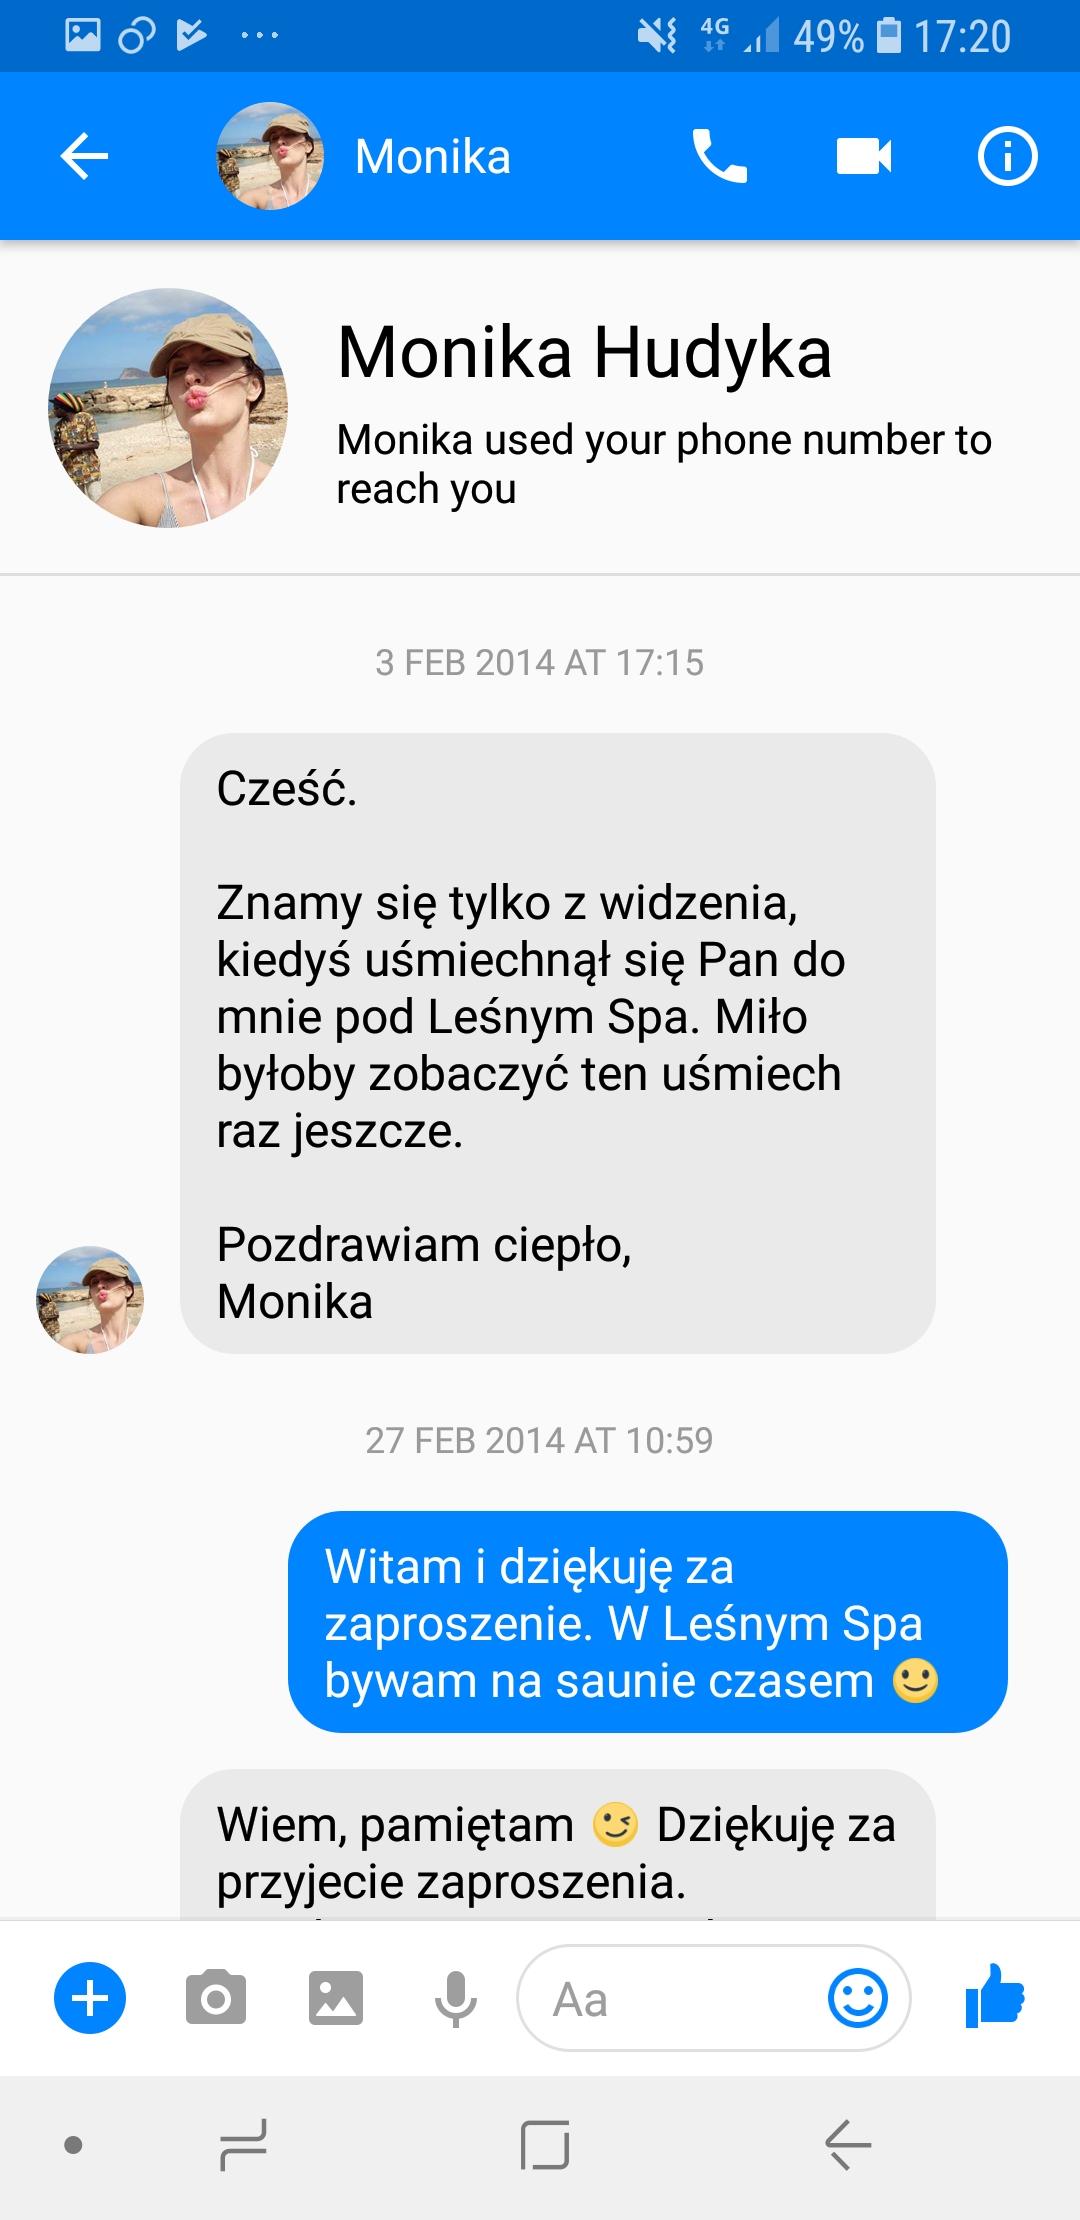 M. Hudyka